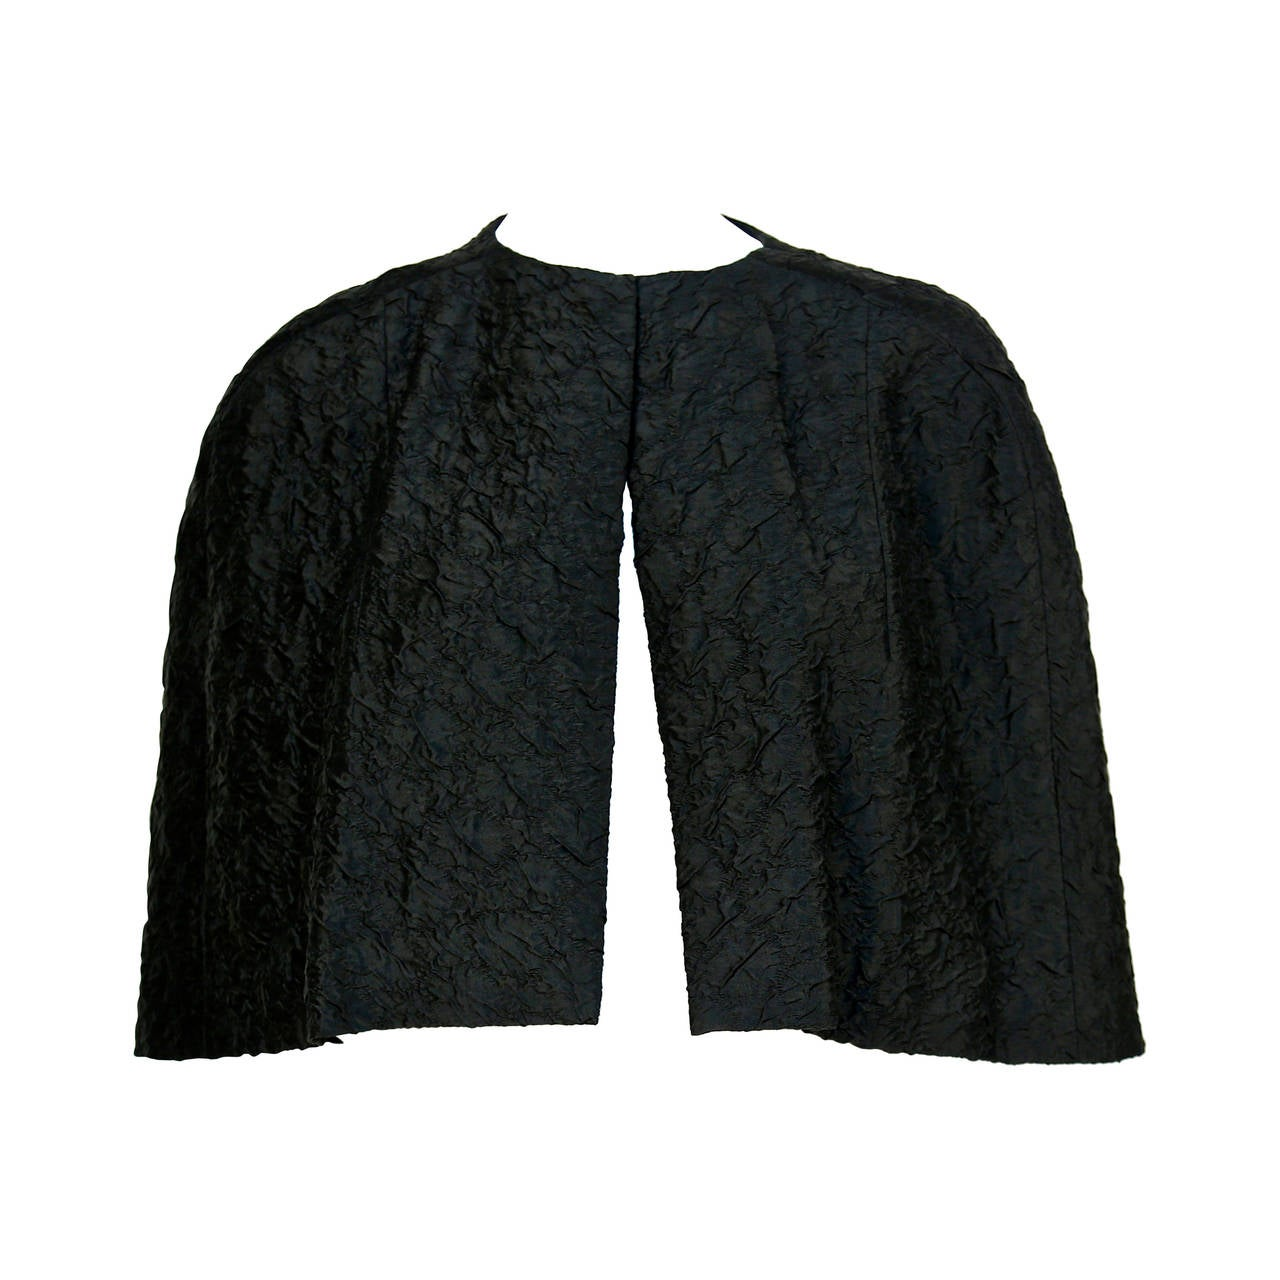 1960's CRISTOBAL BALENCIAGA EISA haute couture black silk capelet